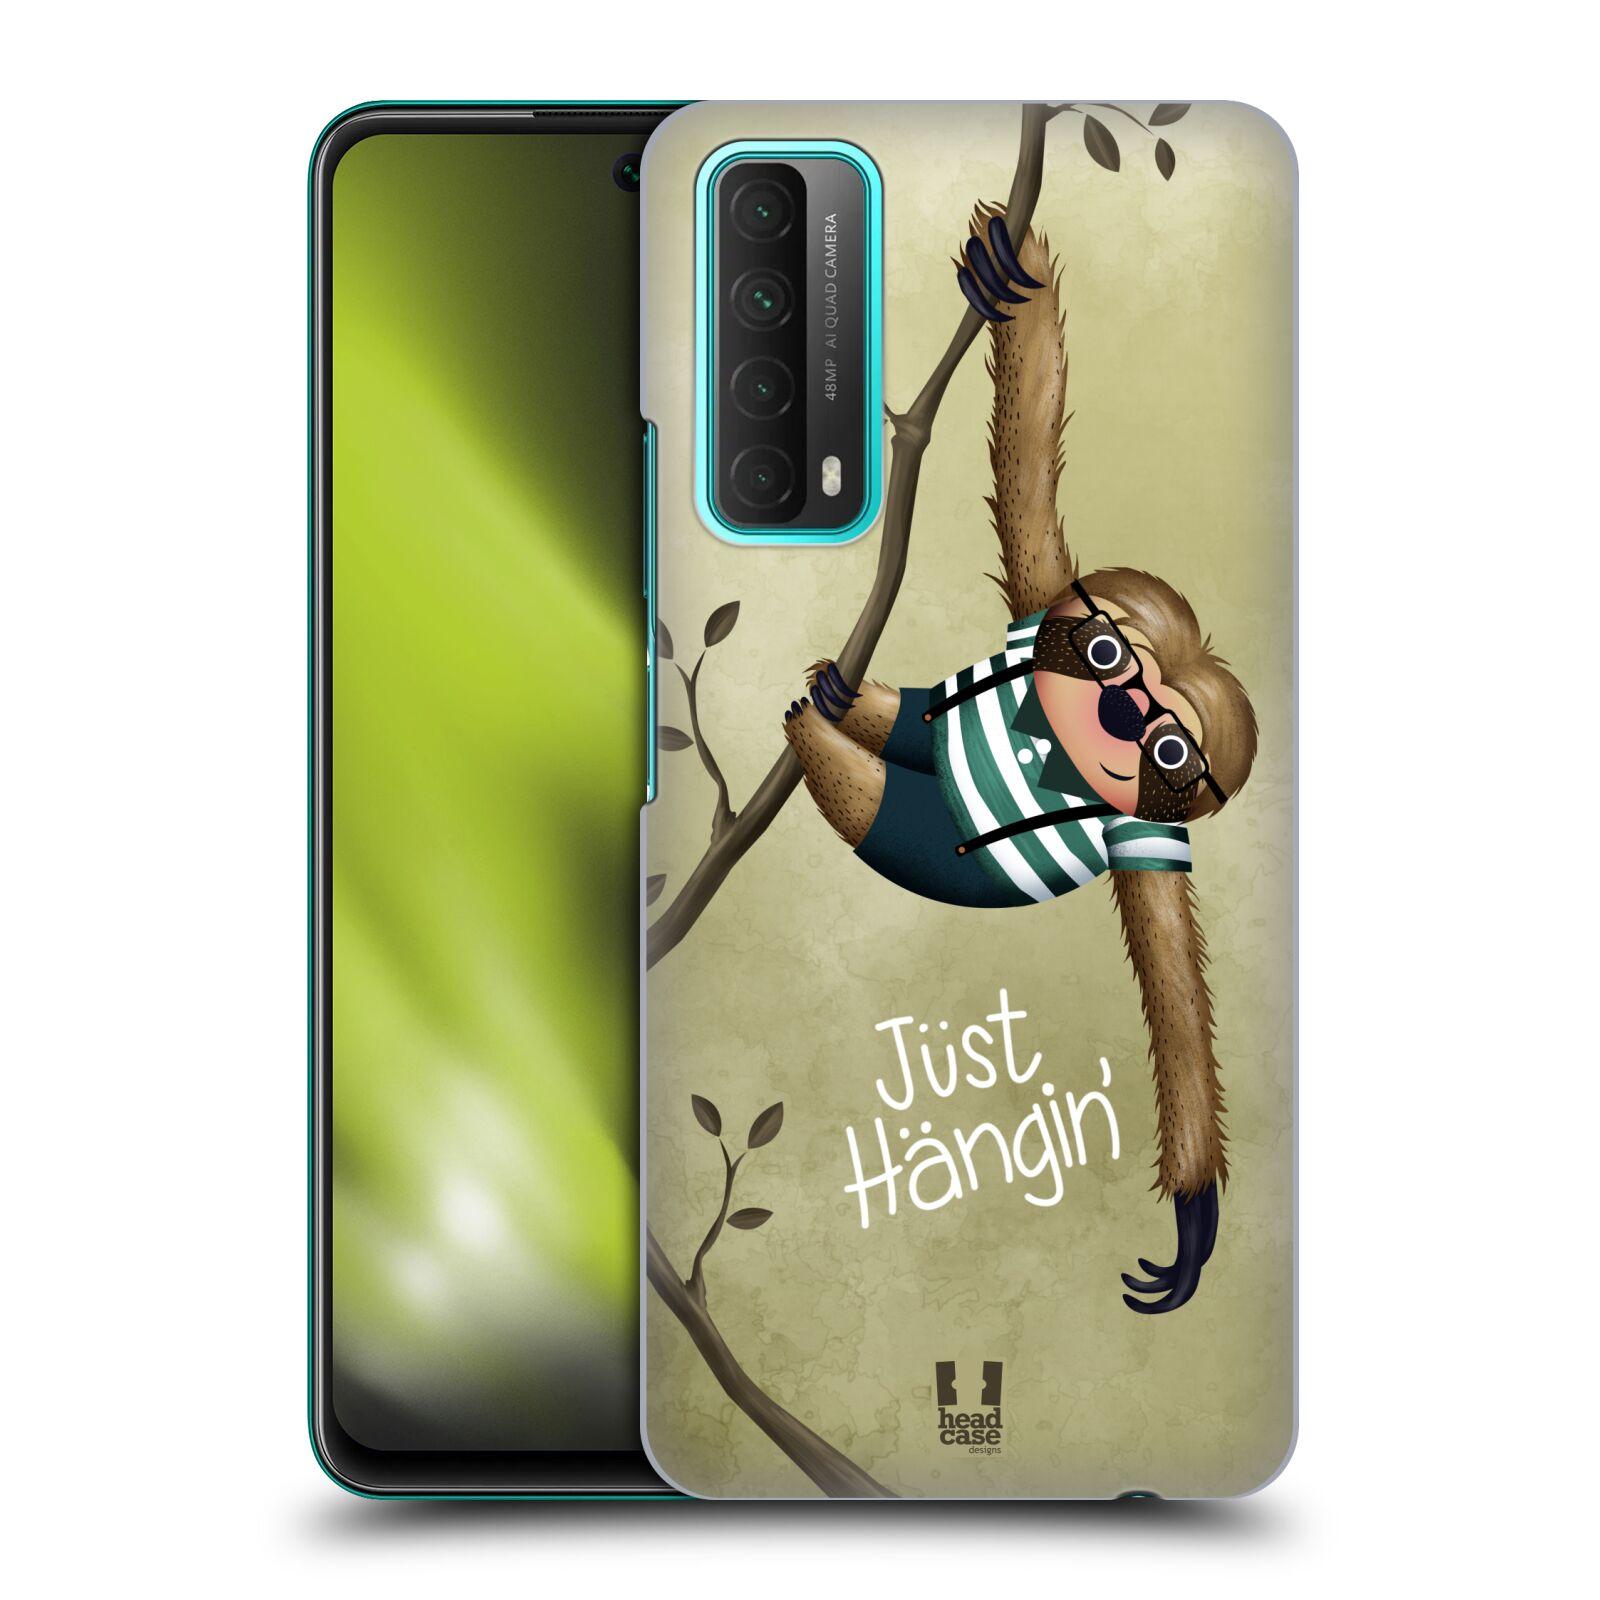 Plastové pouzdro na mobil Huawei P Smart (2021) - Head Case - Lenochod Just Hangin